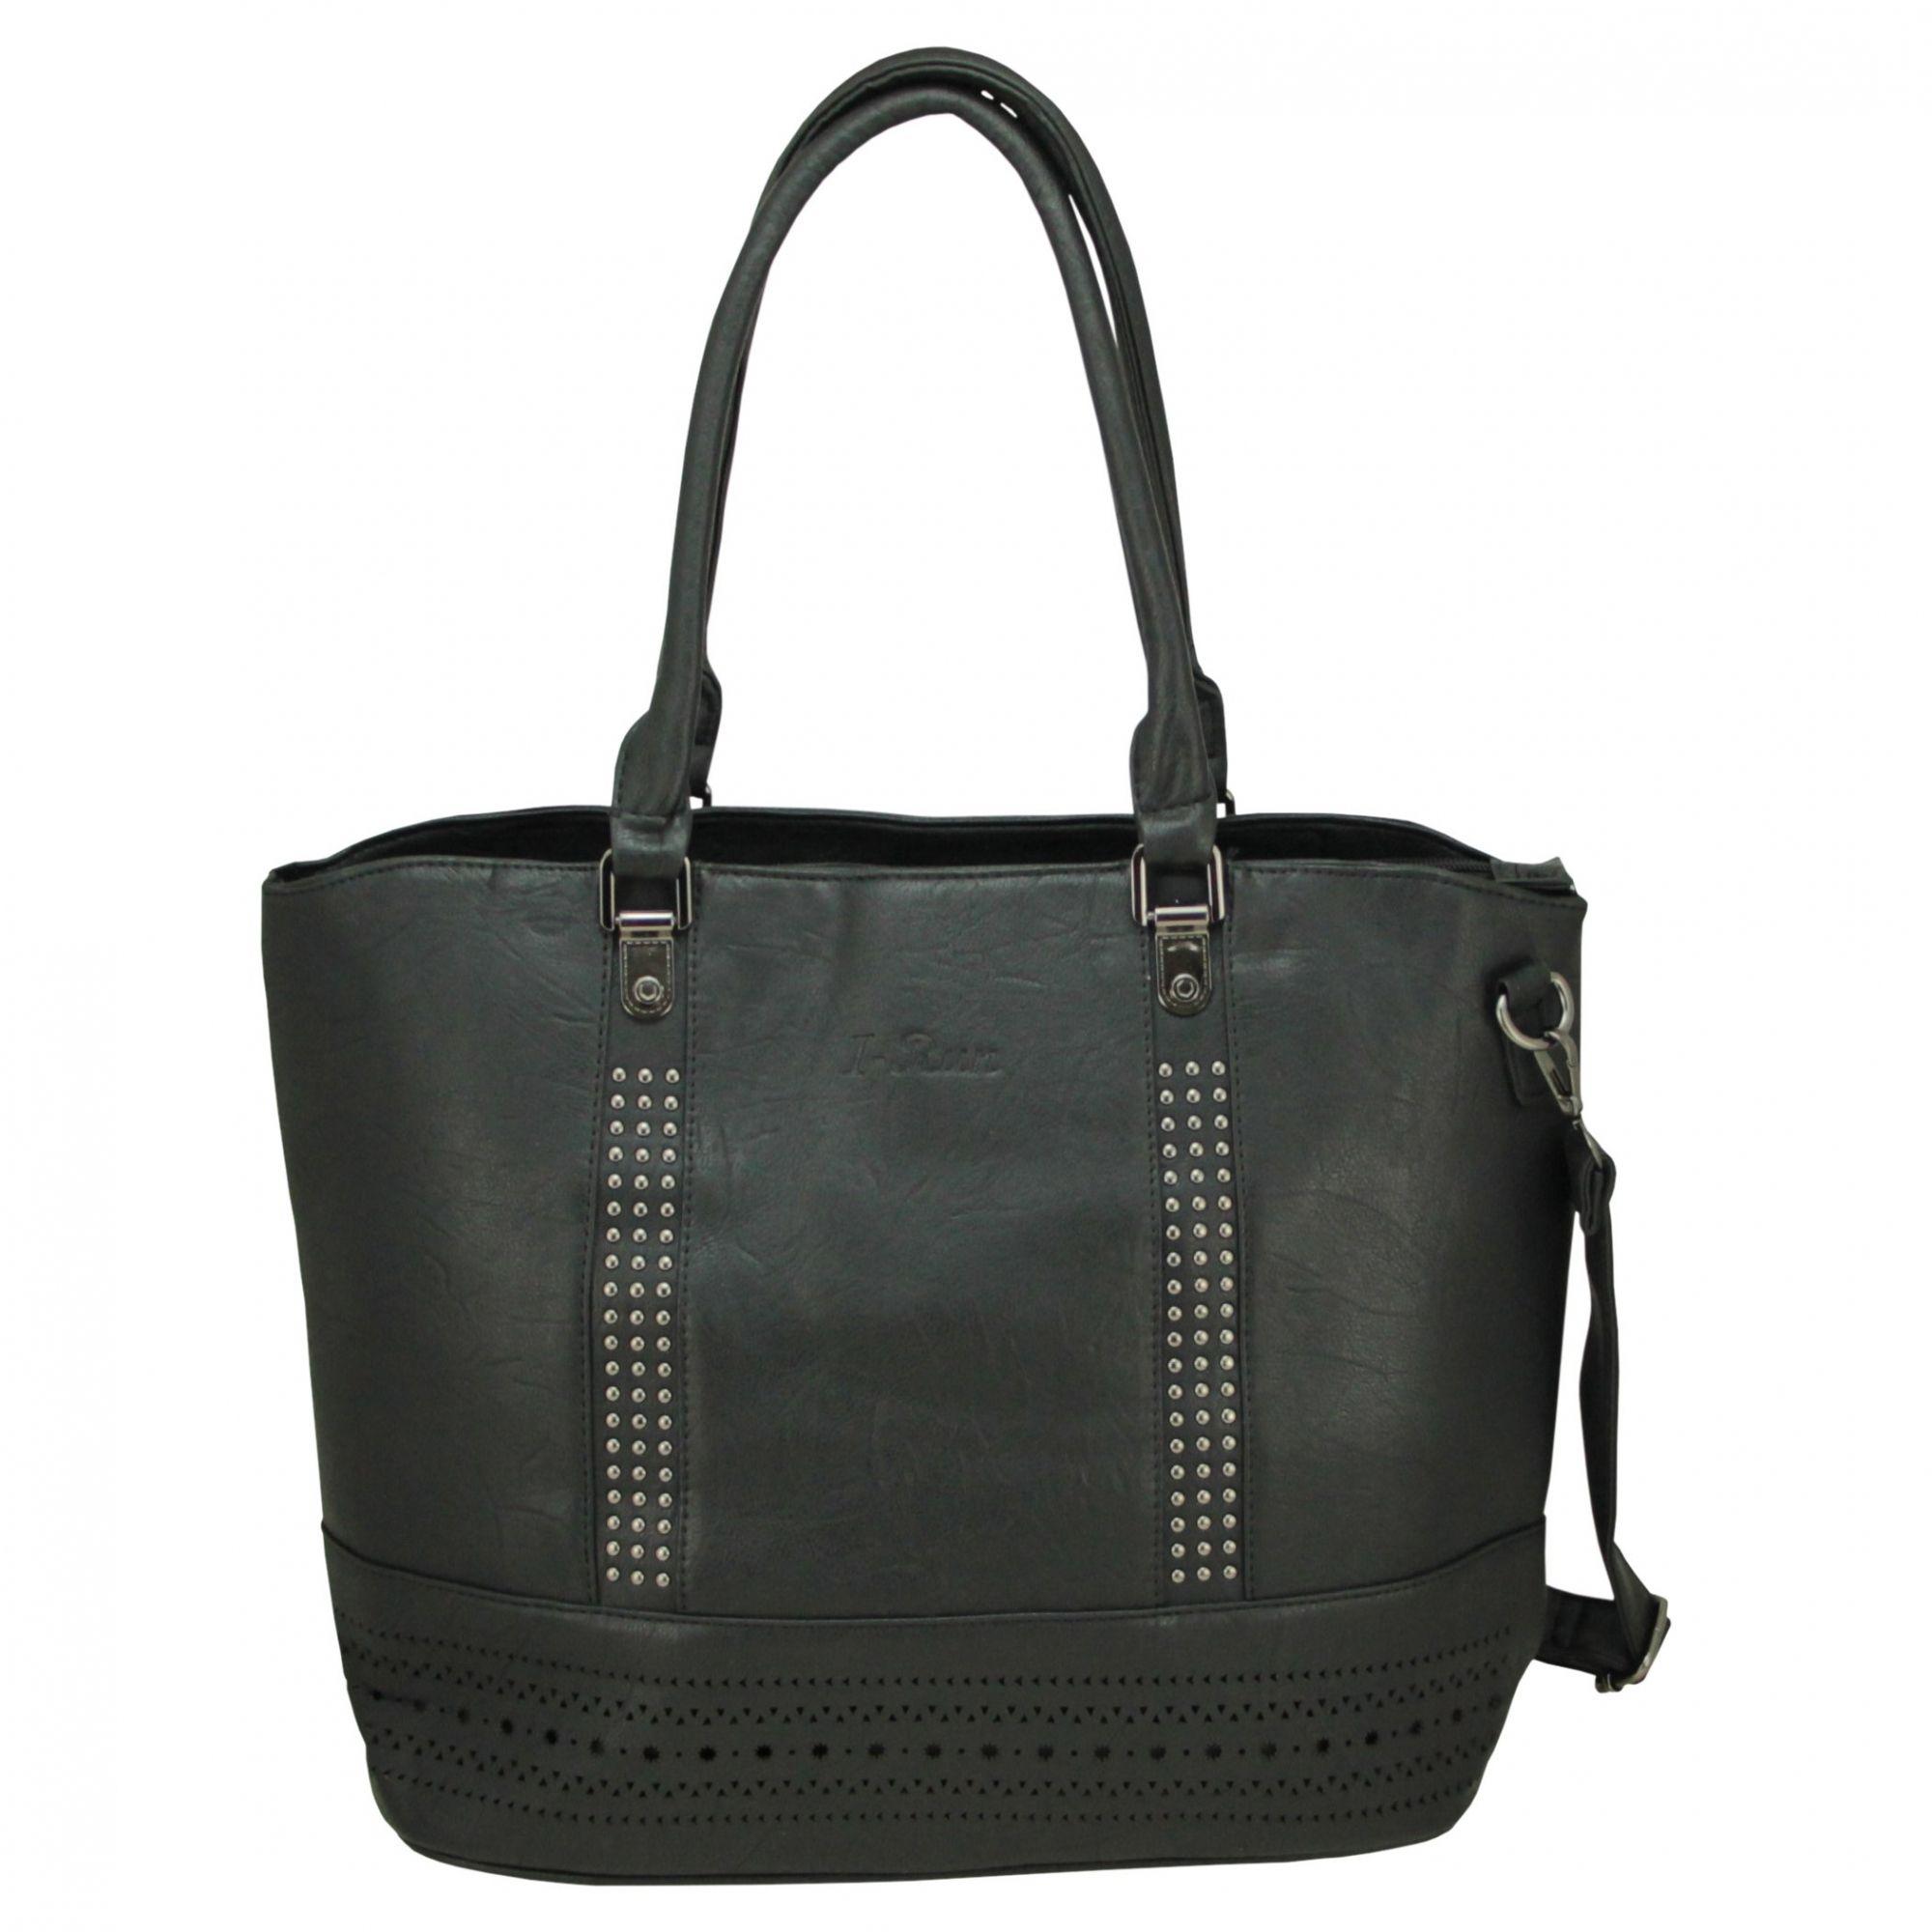 4518c9b10 Bolsa Feminina grande 2 Alças Transversal e ombro tiracolo IR050 - MMS Shop  ...